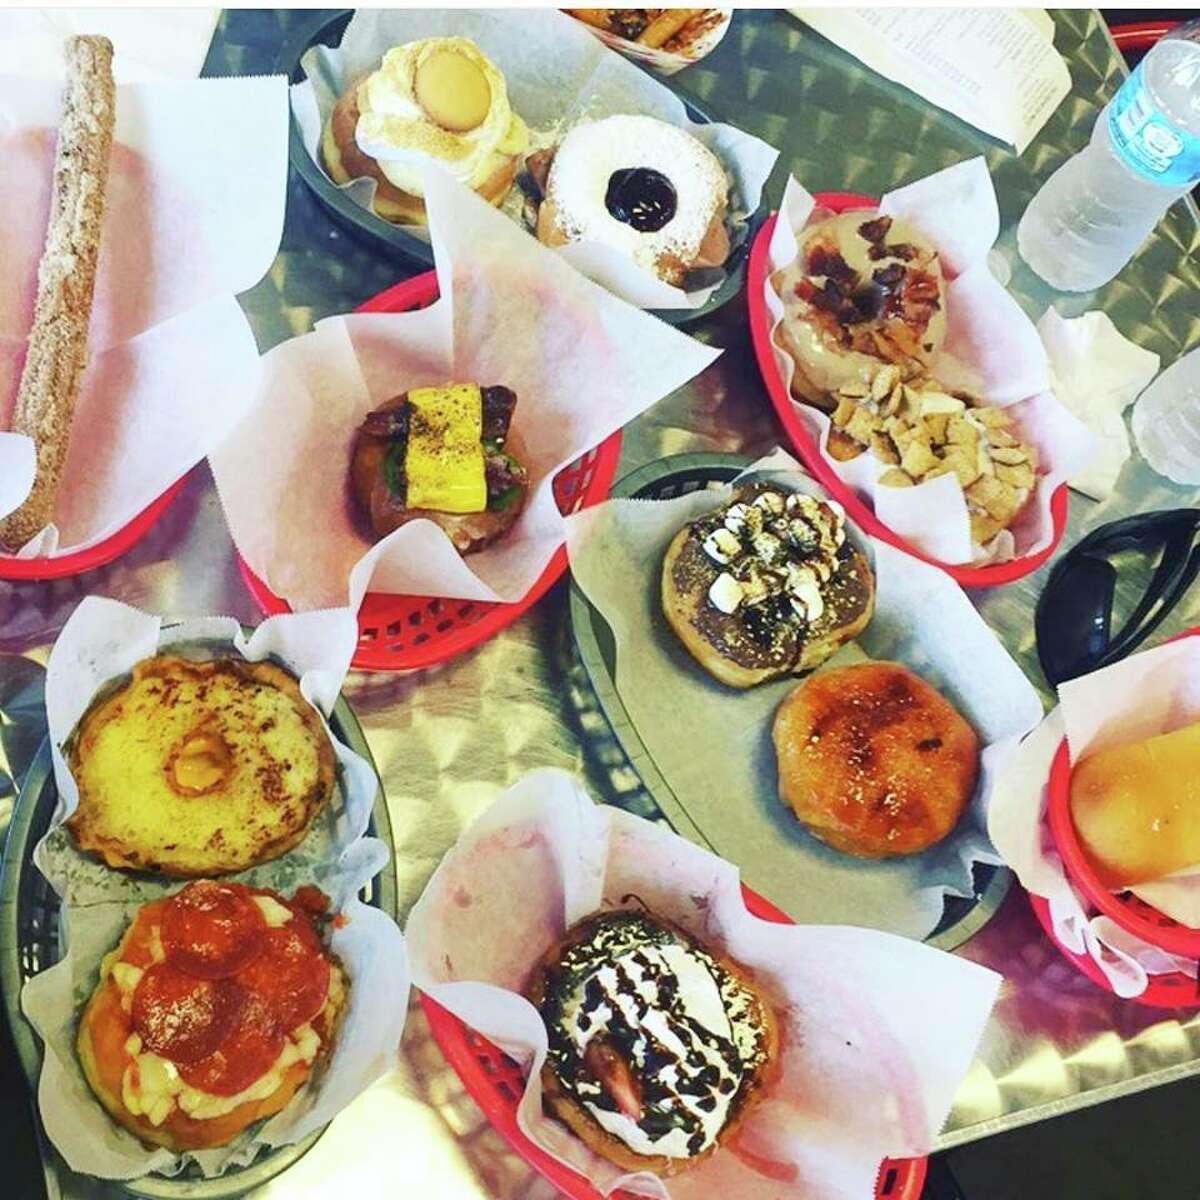 Sugar Land:Grove Do-Nutz & Deli in Richmond will open a breakfast restaurant called Toast in spring 2019.